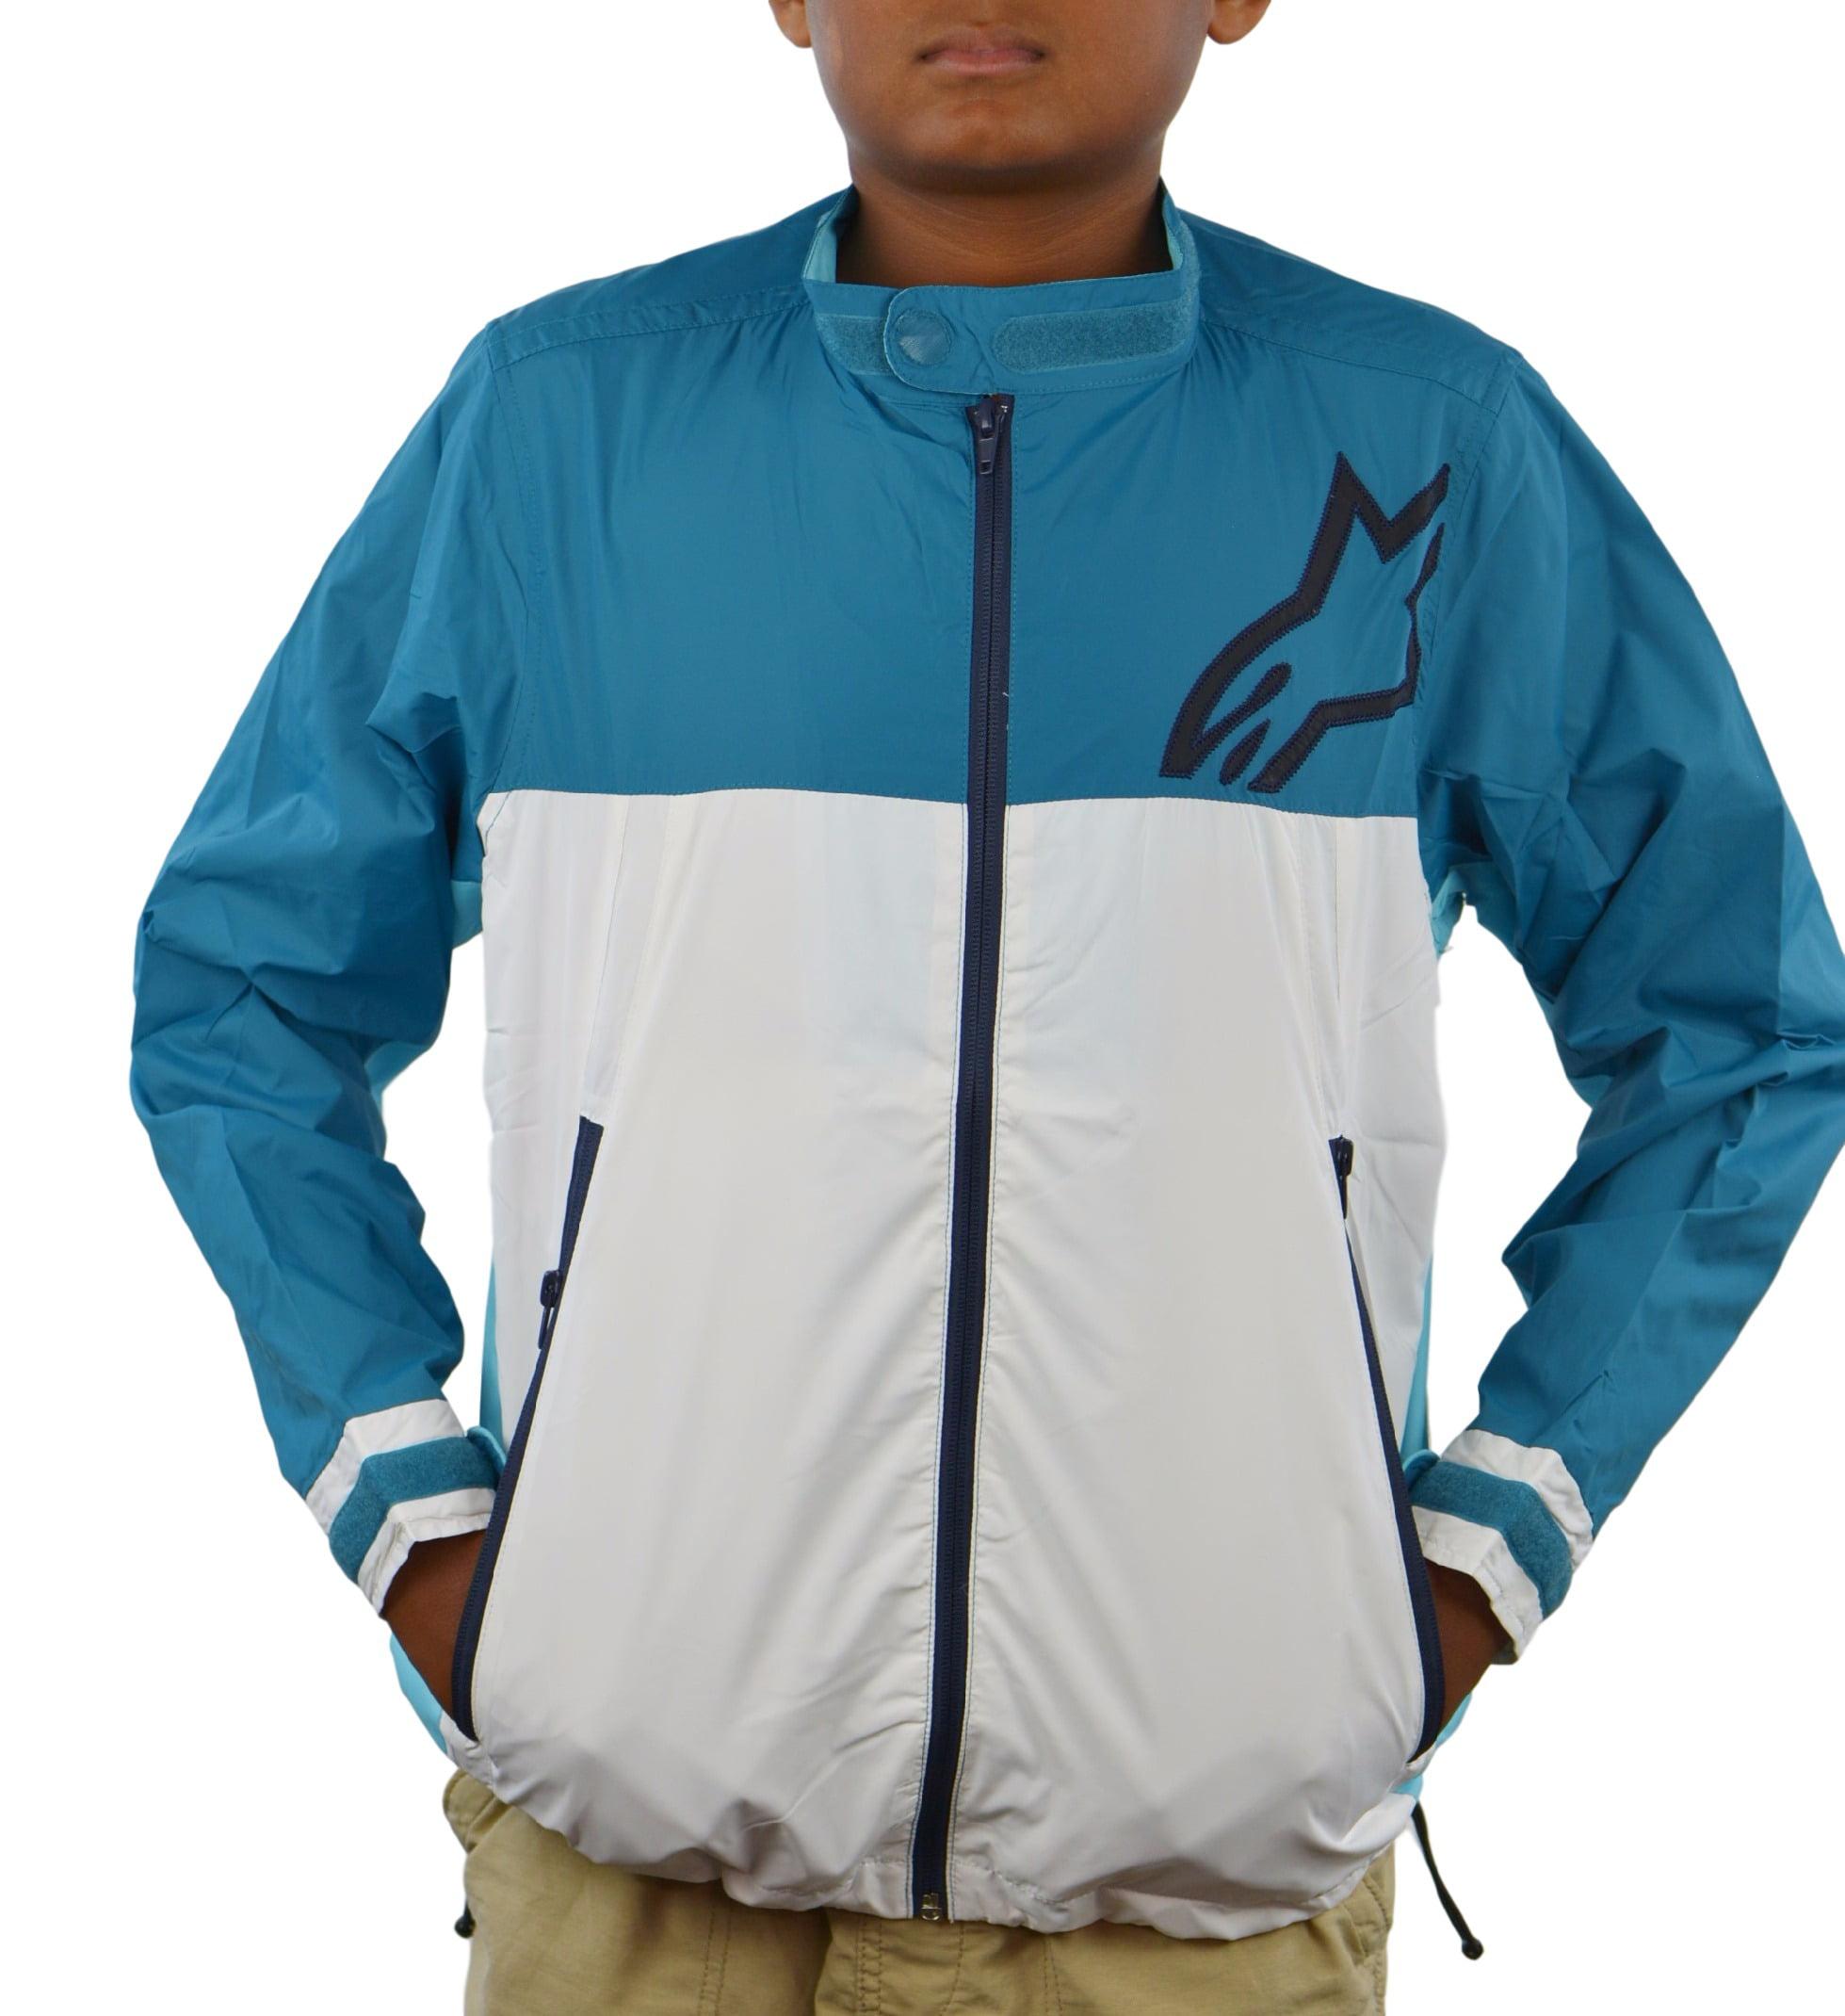 Alpinestars ORIGAMI Boys Jacket Polyester Windbreaker, Teal